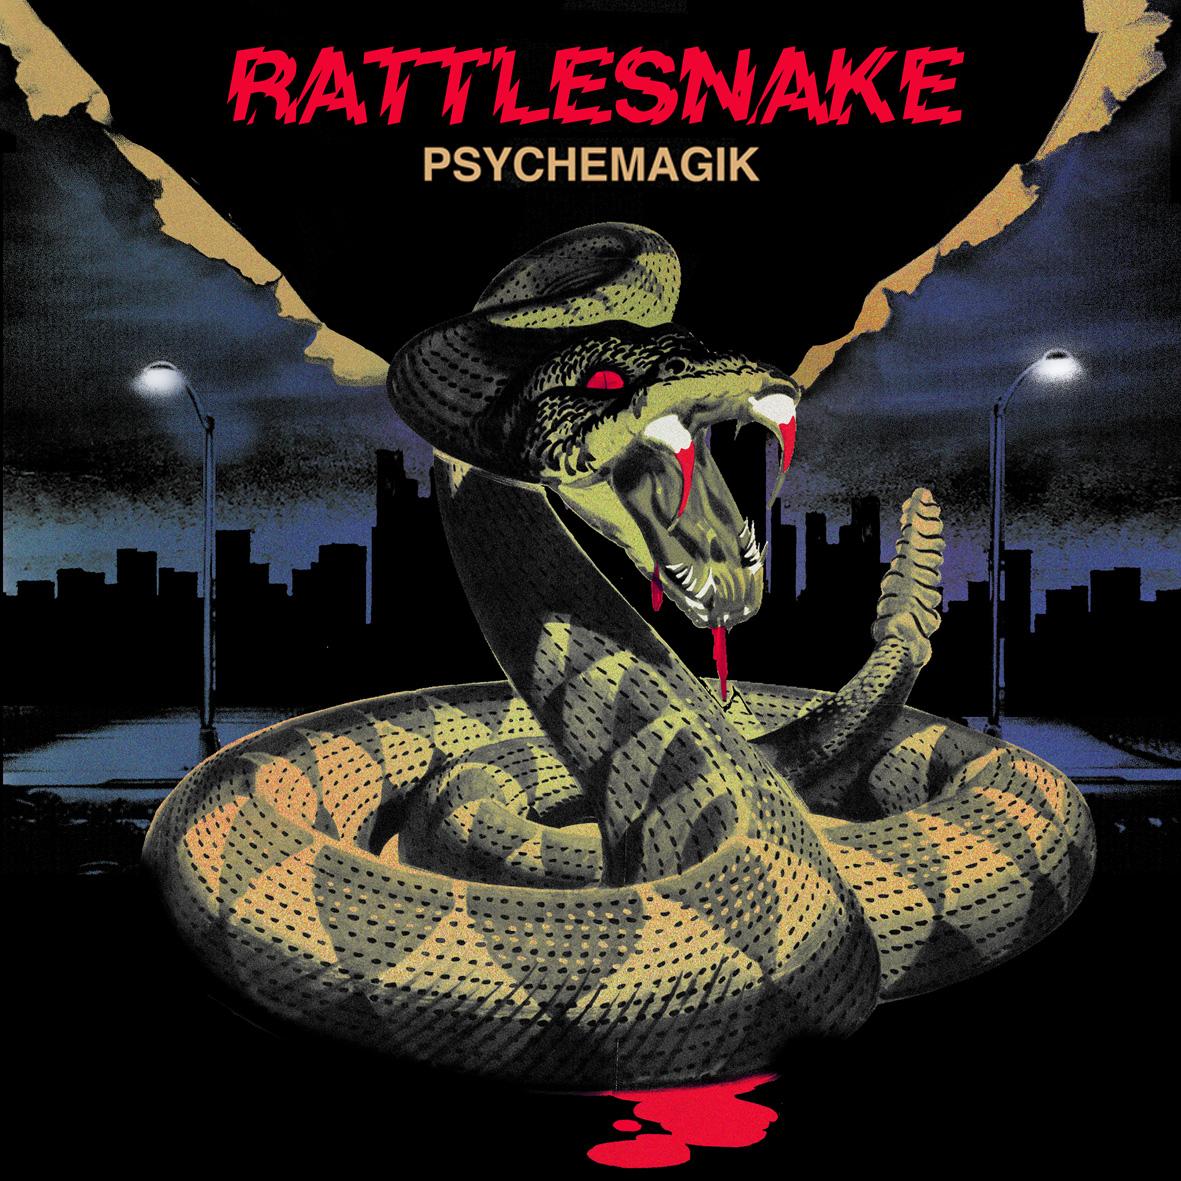 Psychemagik - Rattlesnake EP [PETS105]